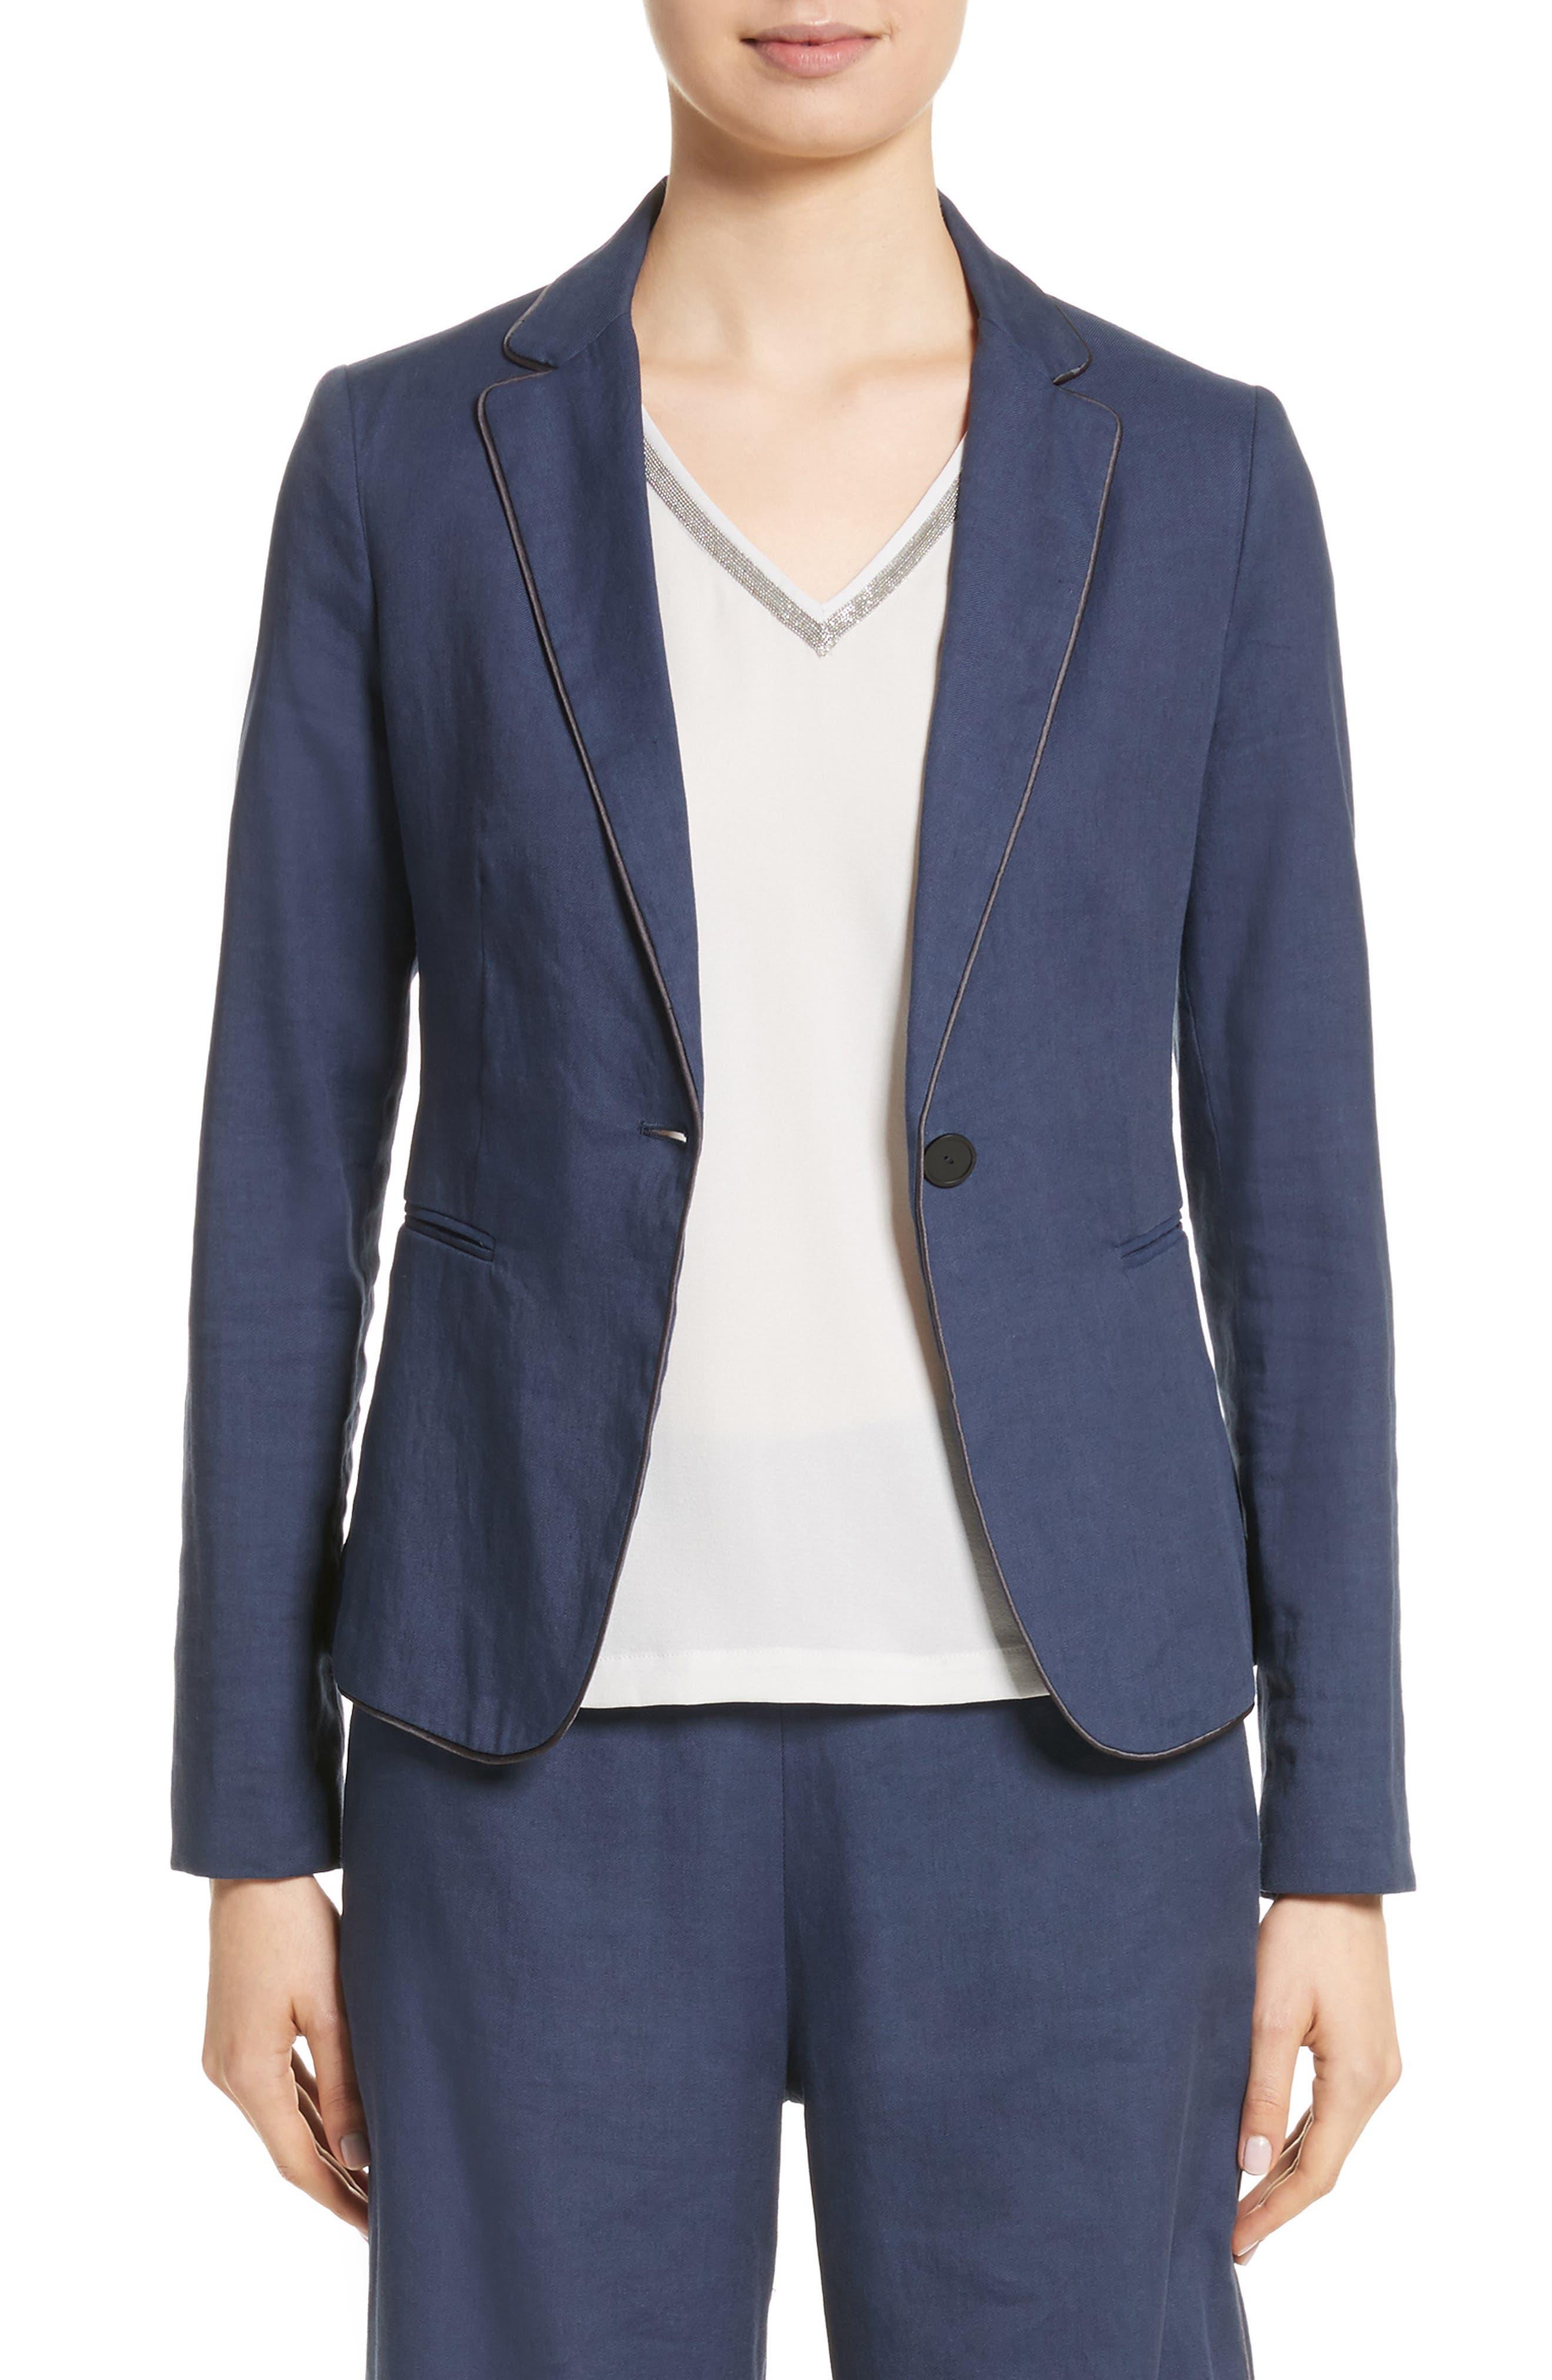 Piped Linen & Cotton Blend Blazer,                         Main,                         color,